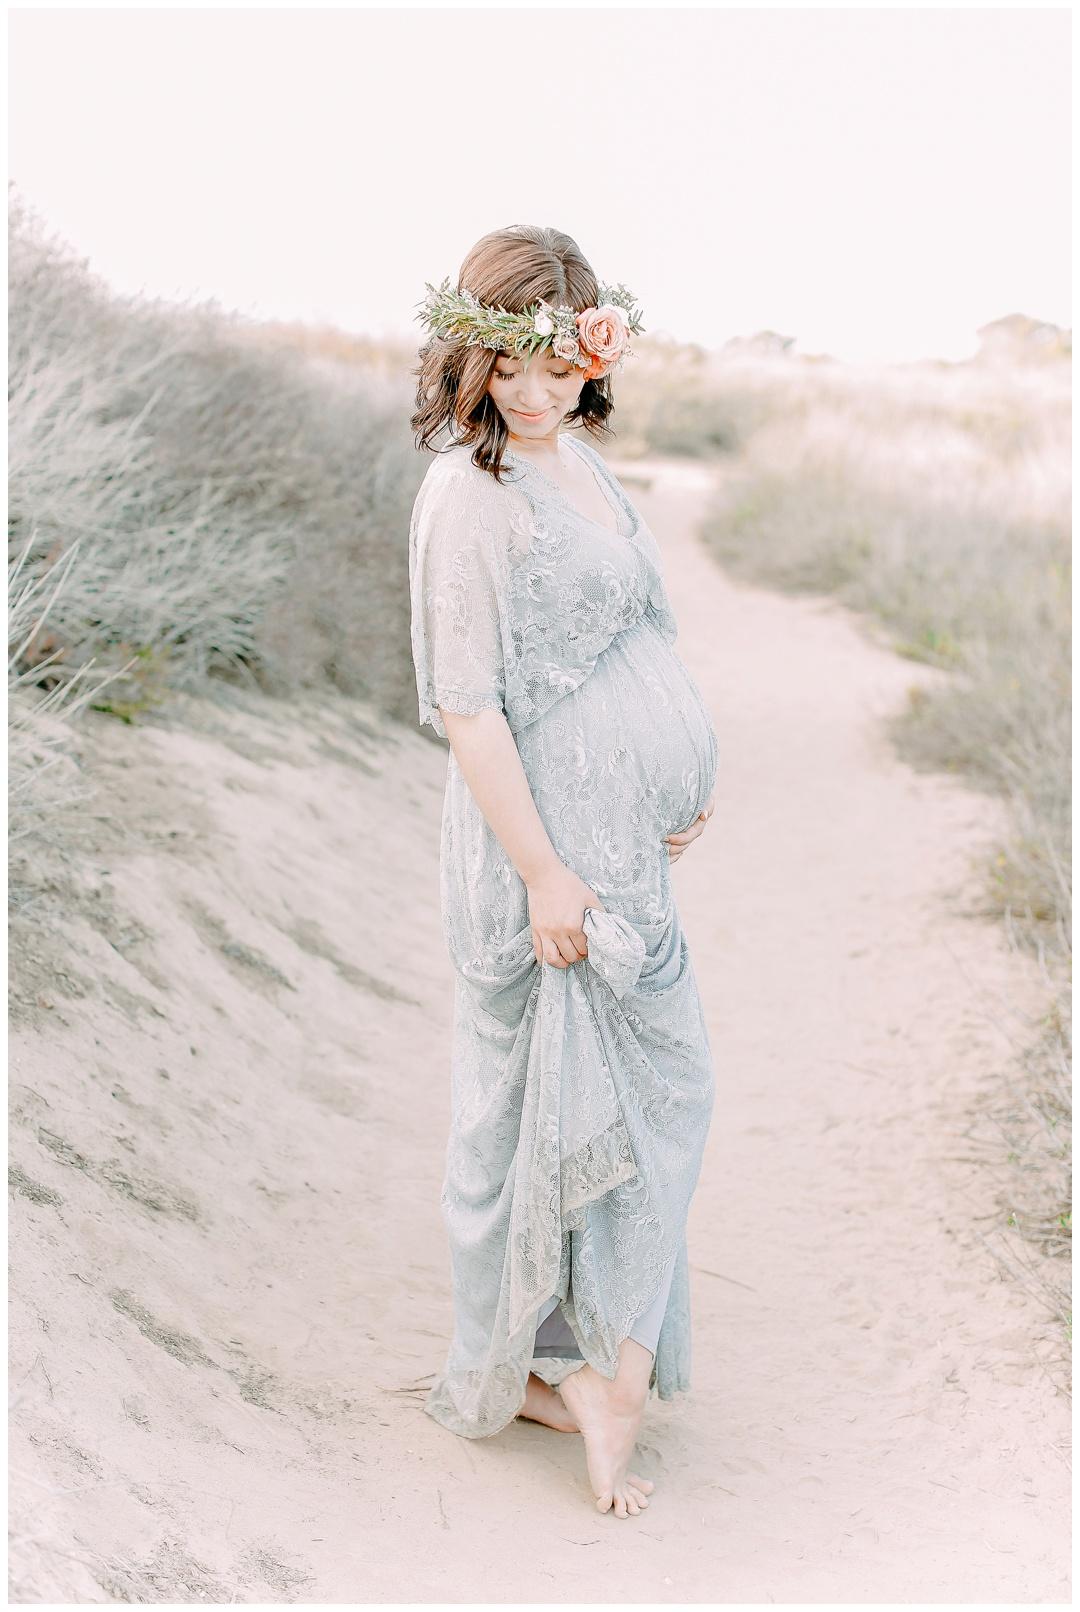 Newport_Beach_Maternity_Photographer_Orange_County_Maternity_Photography_Cori_Kleckner_Photography_Orange_County_Family_Photographer_Beach_Maternity_Session_1119.jpg